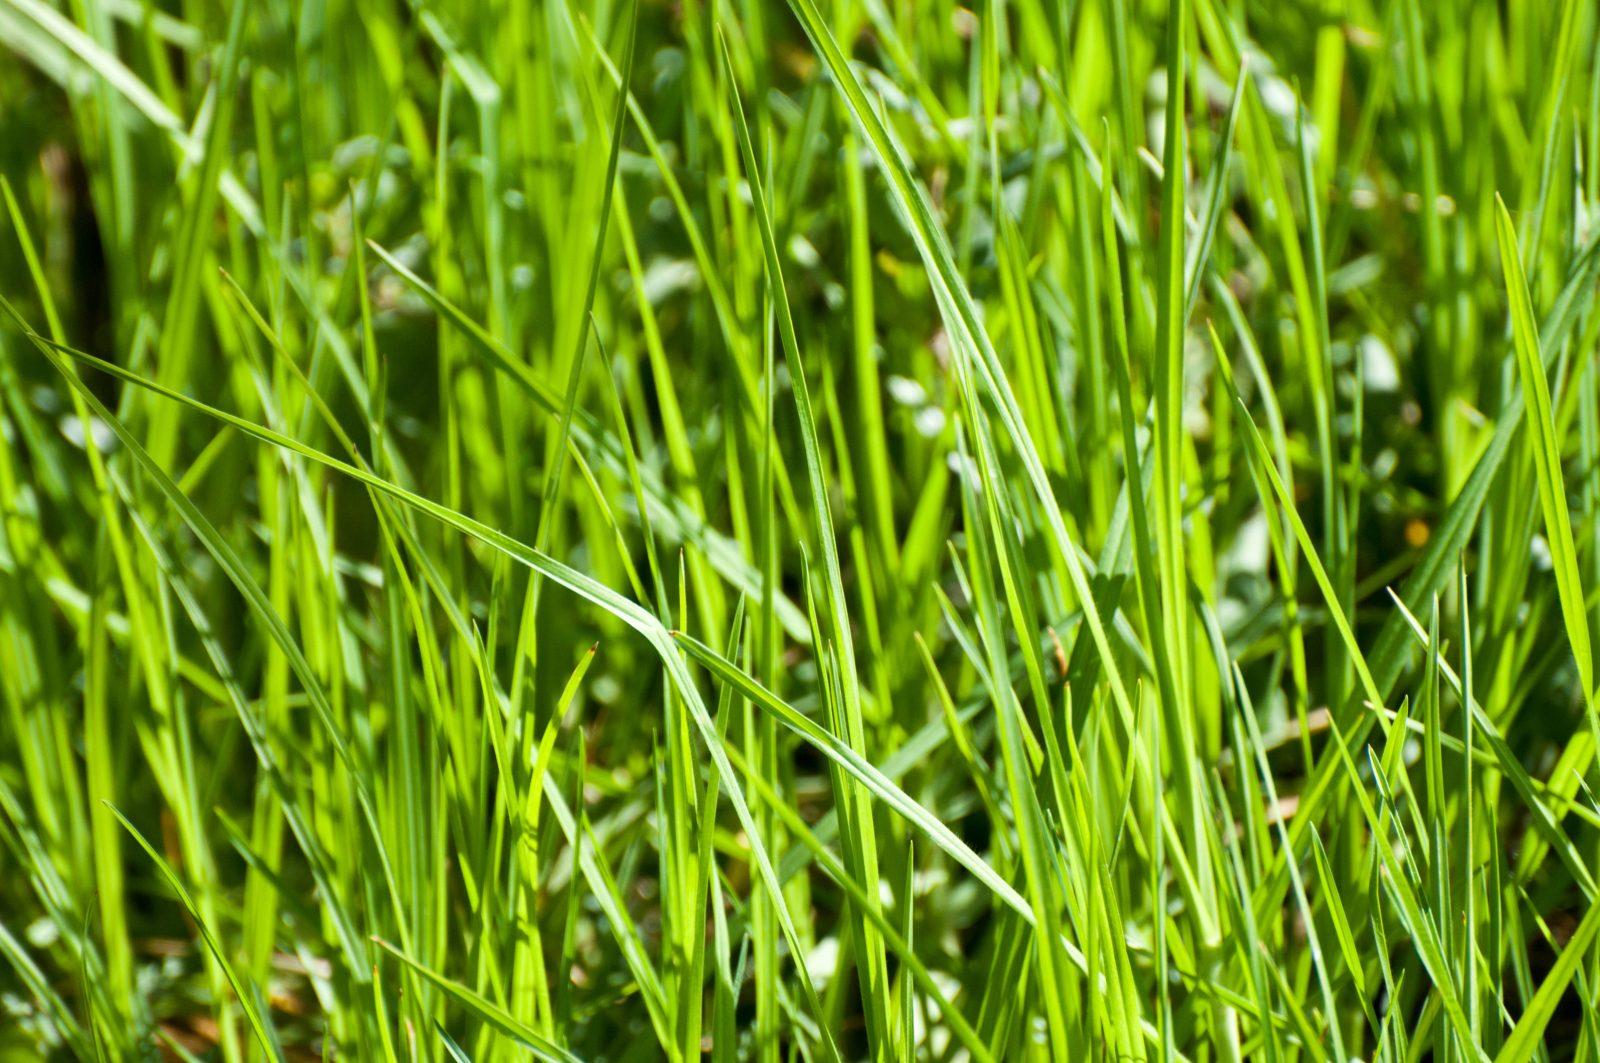 Long Strands of Grass